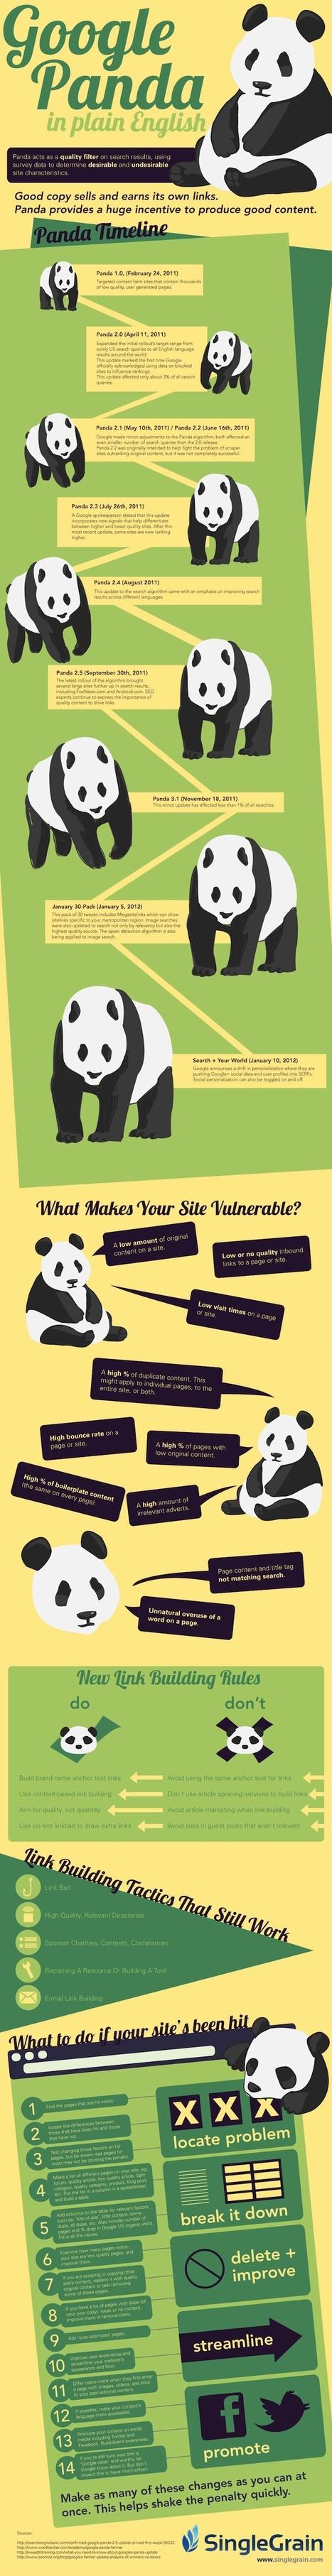 Google Panda in Plain English (Infographic) - Single Grain | SocialMediaDesign | Scoop.it